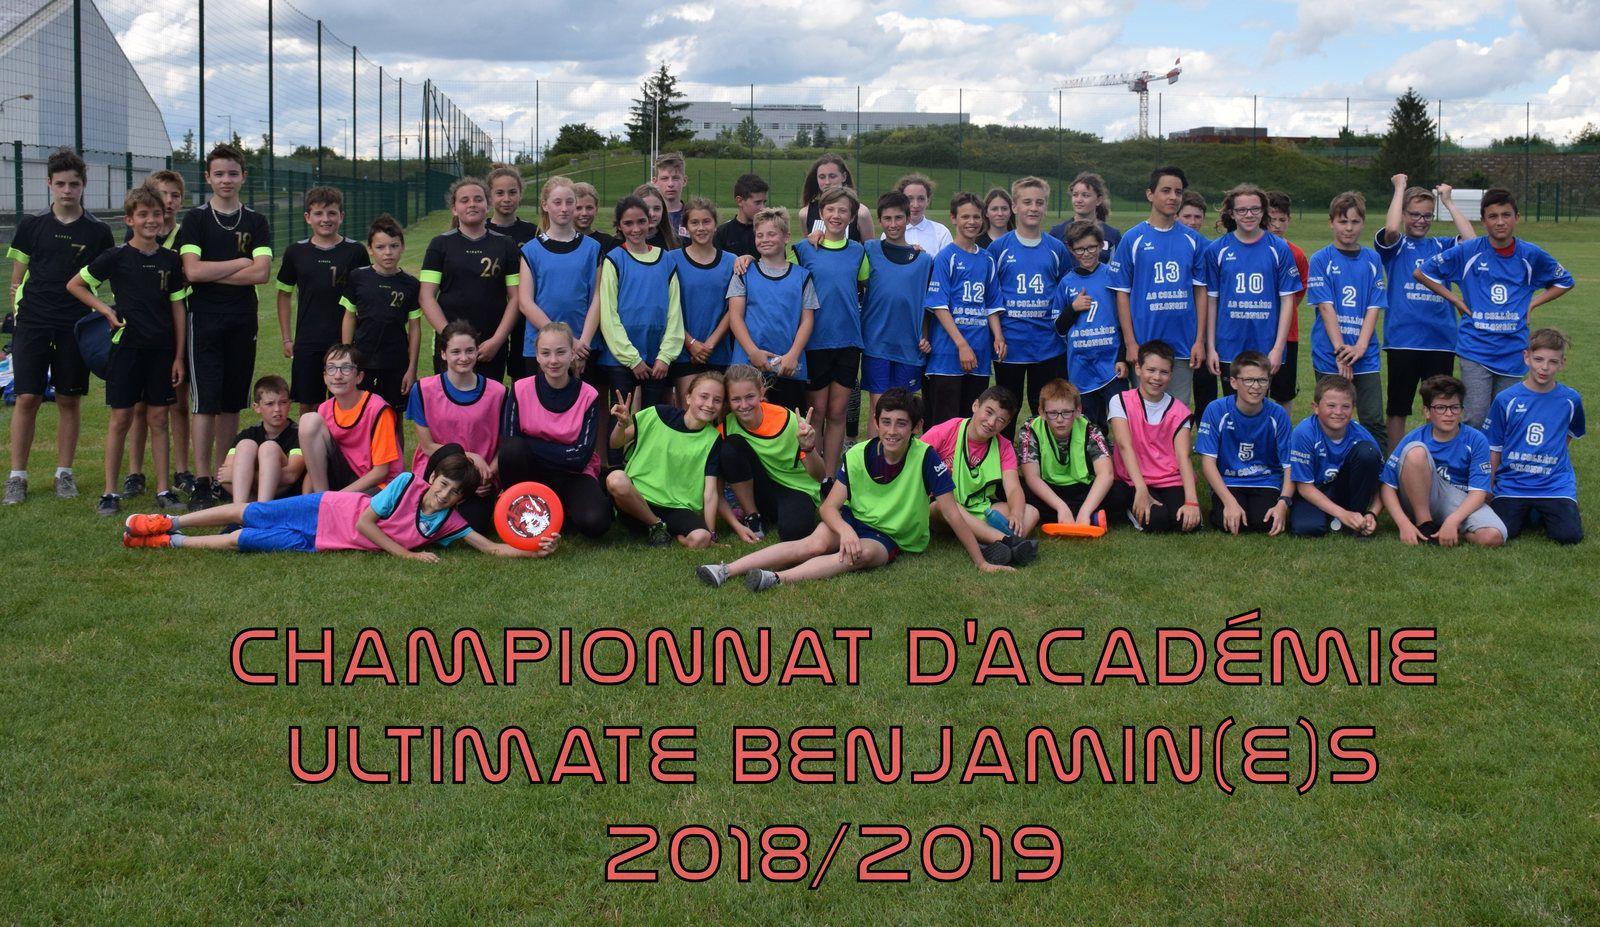 CHAMPIONNAT ACADEMIE ULTIMATE BENJAMIN(E)S 2018/2019